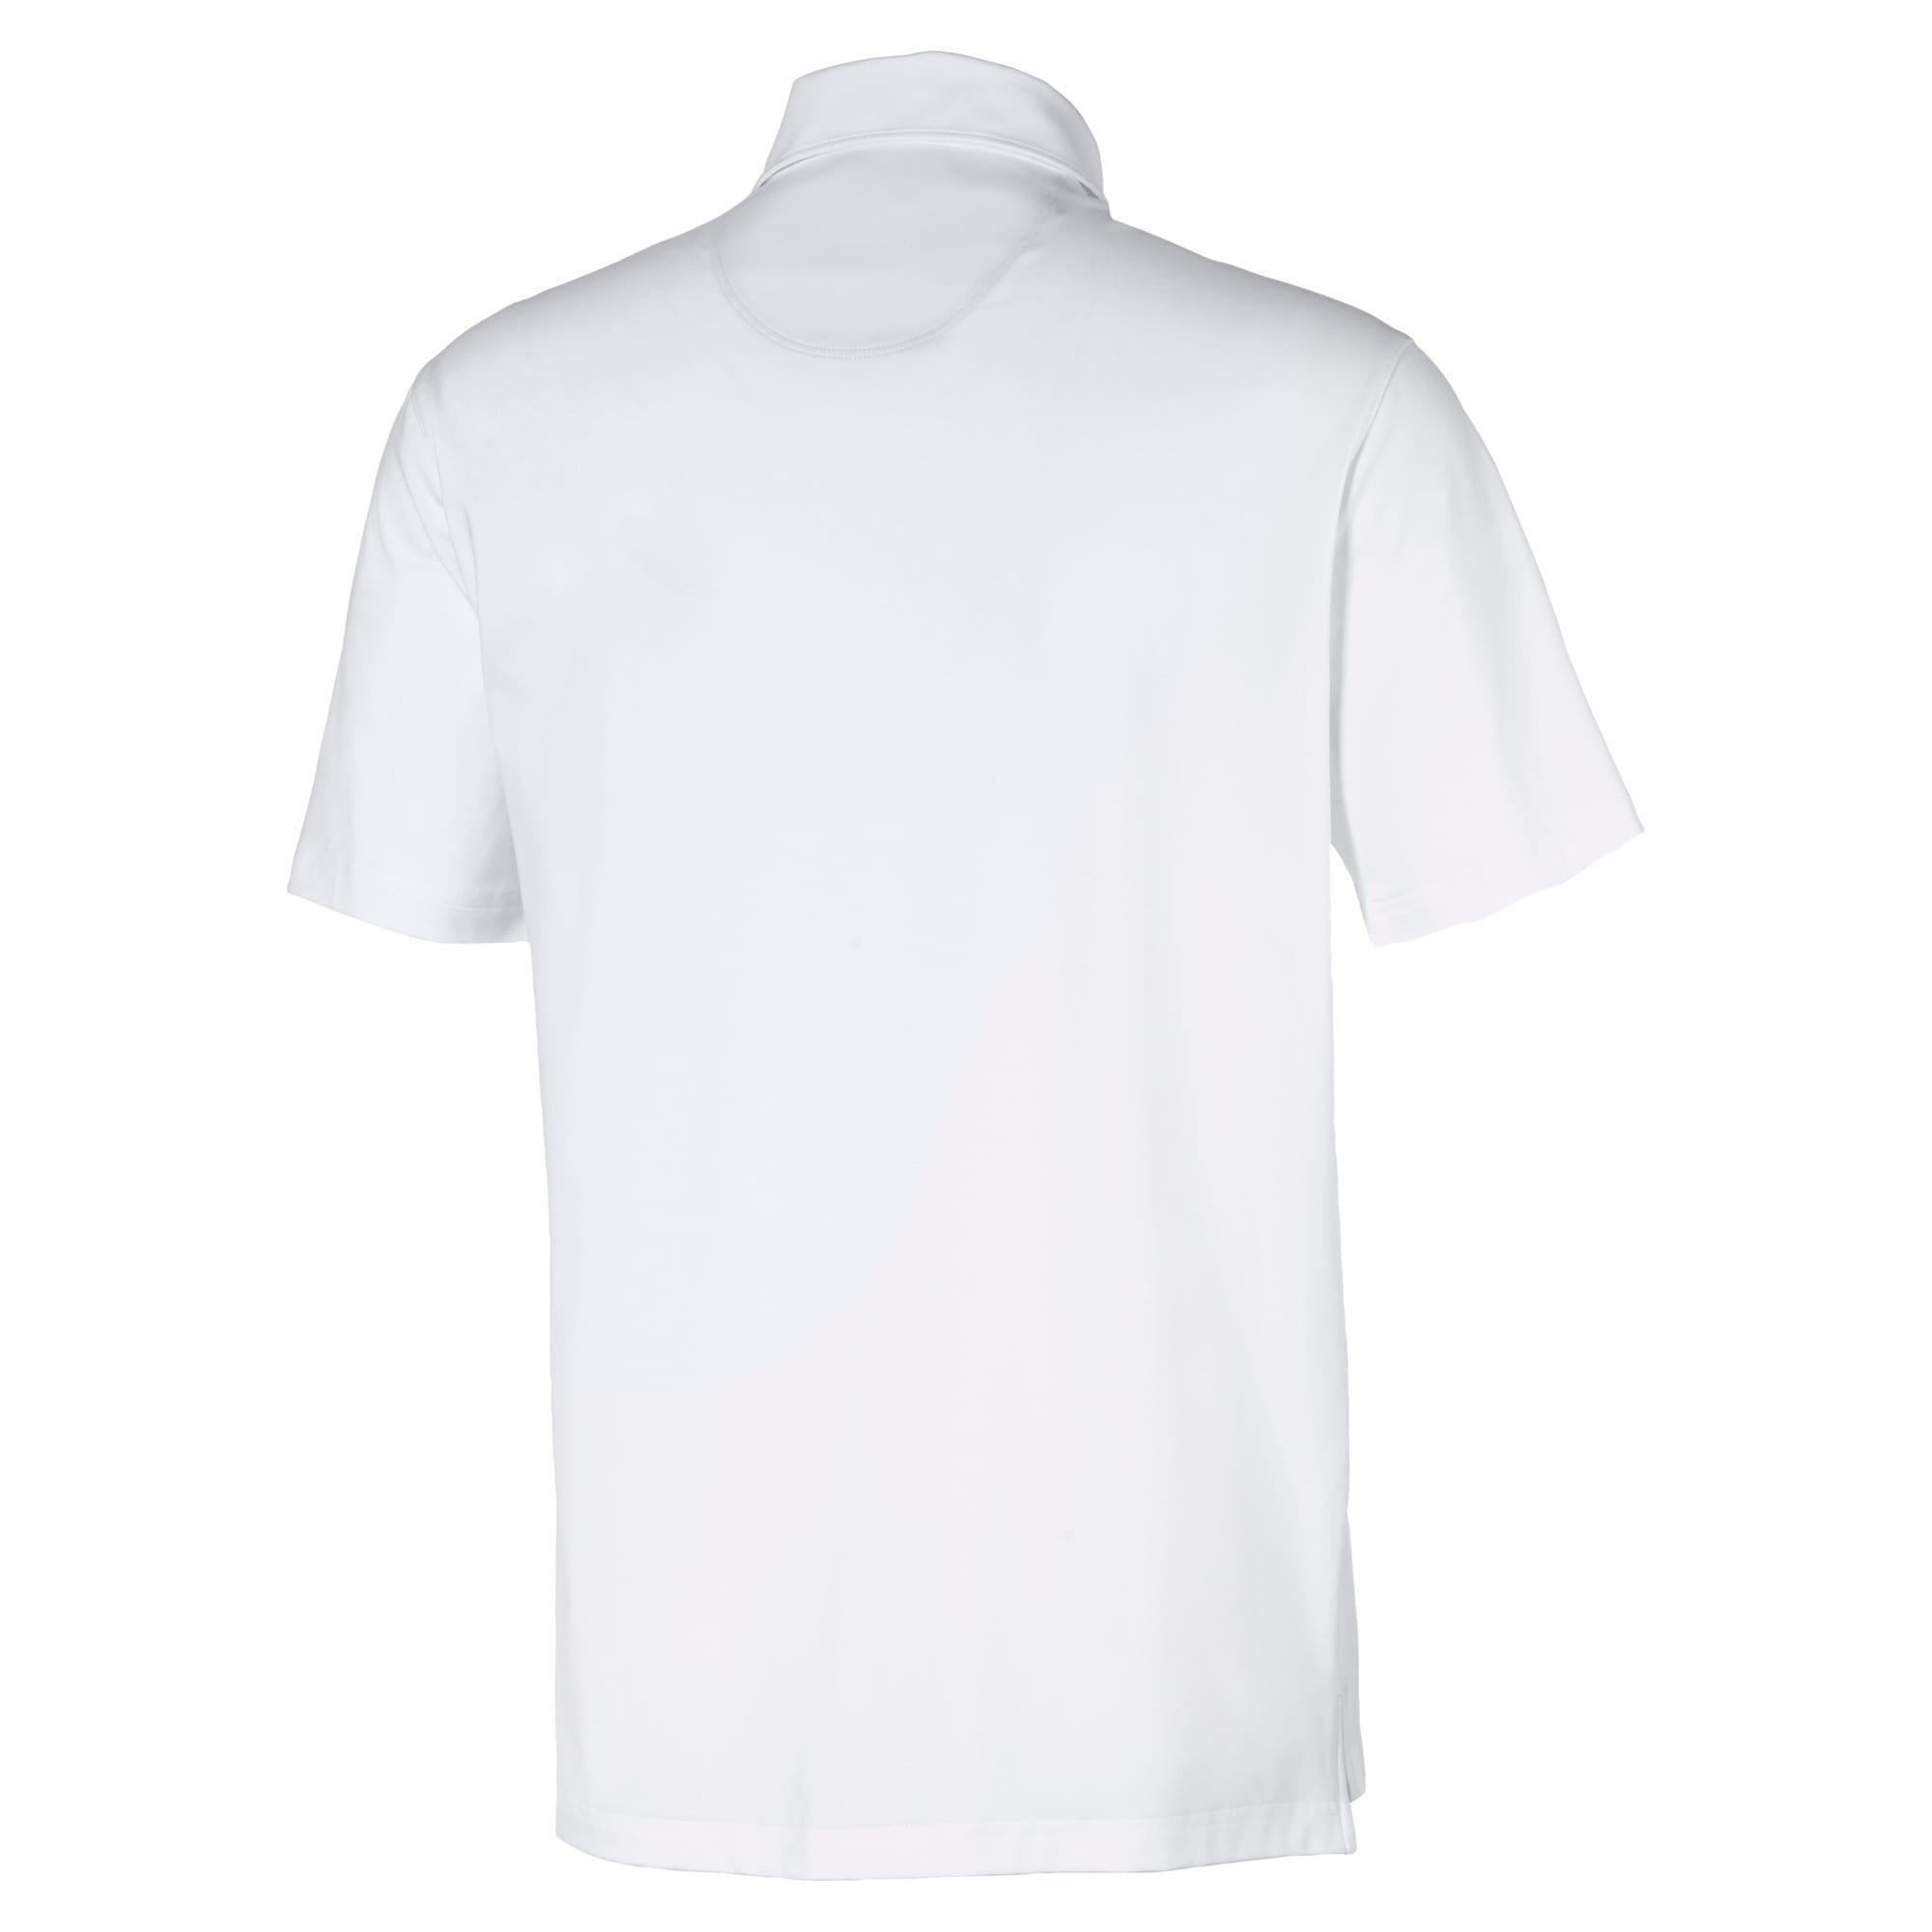 Thumbnail 6 of Donegal Men's Golf Polo, Bright White, medium